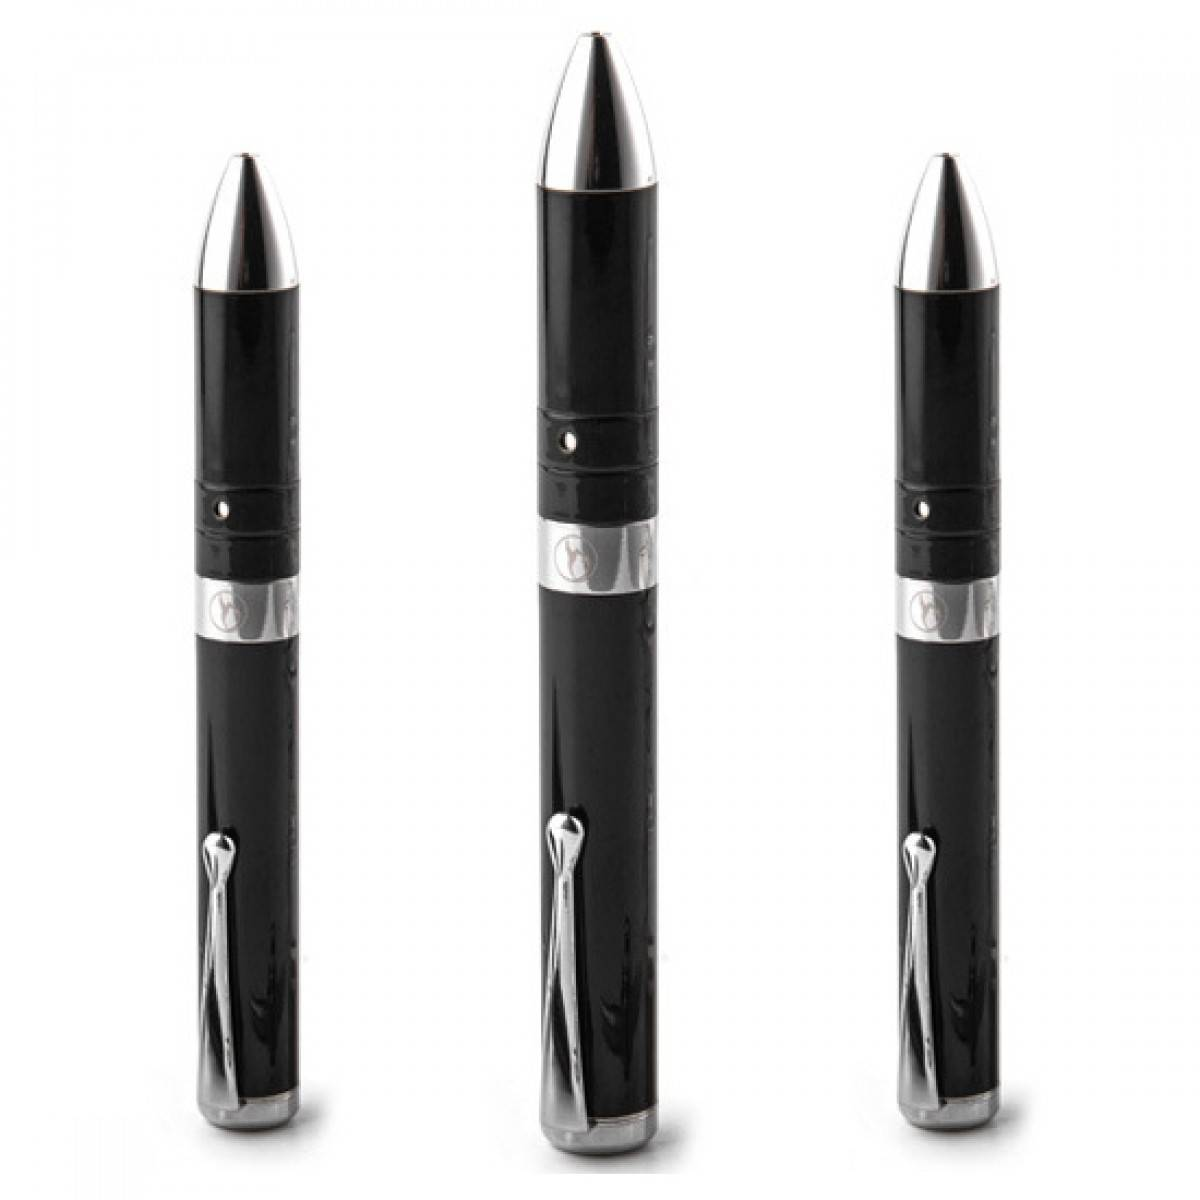 Micro Vaped Executive Pen Vaporizer Nano V4